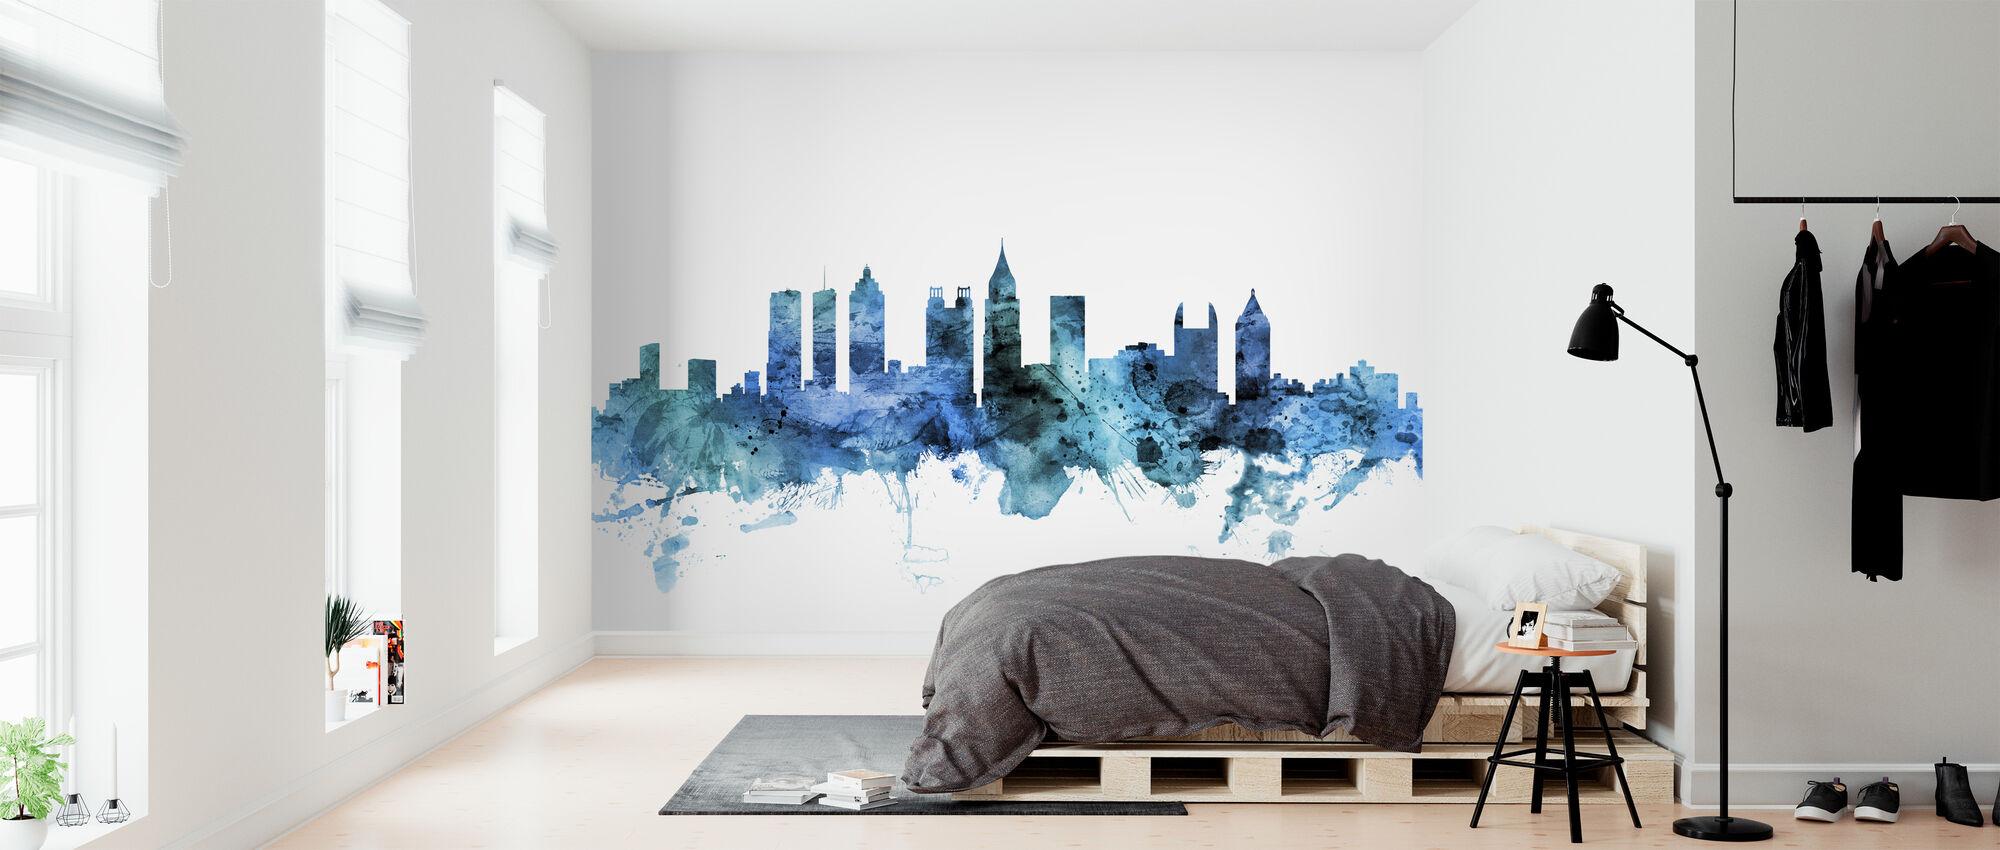 Atlanta Georgia Skyline - Wallpaper - Bedroom